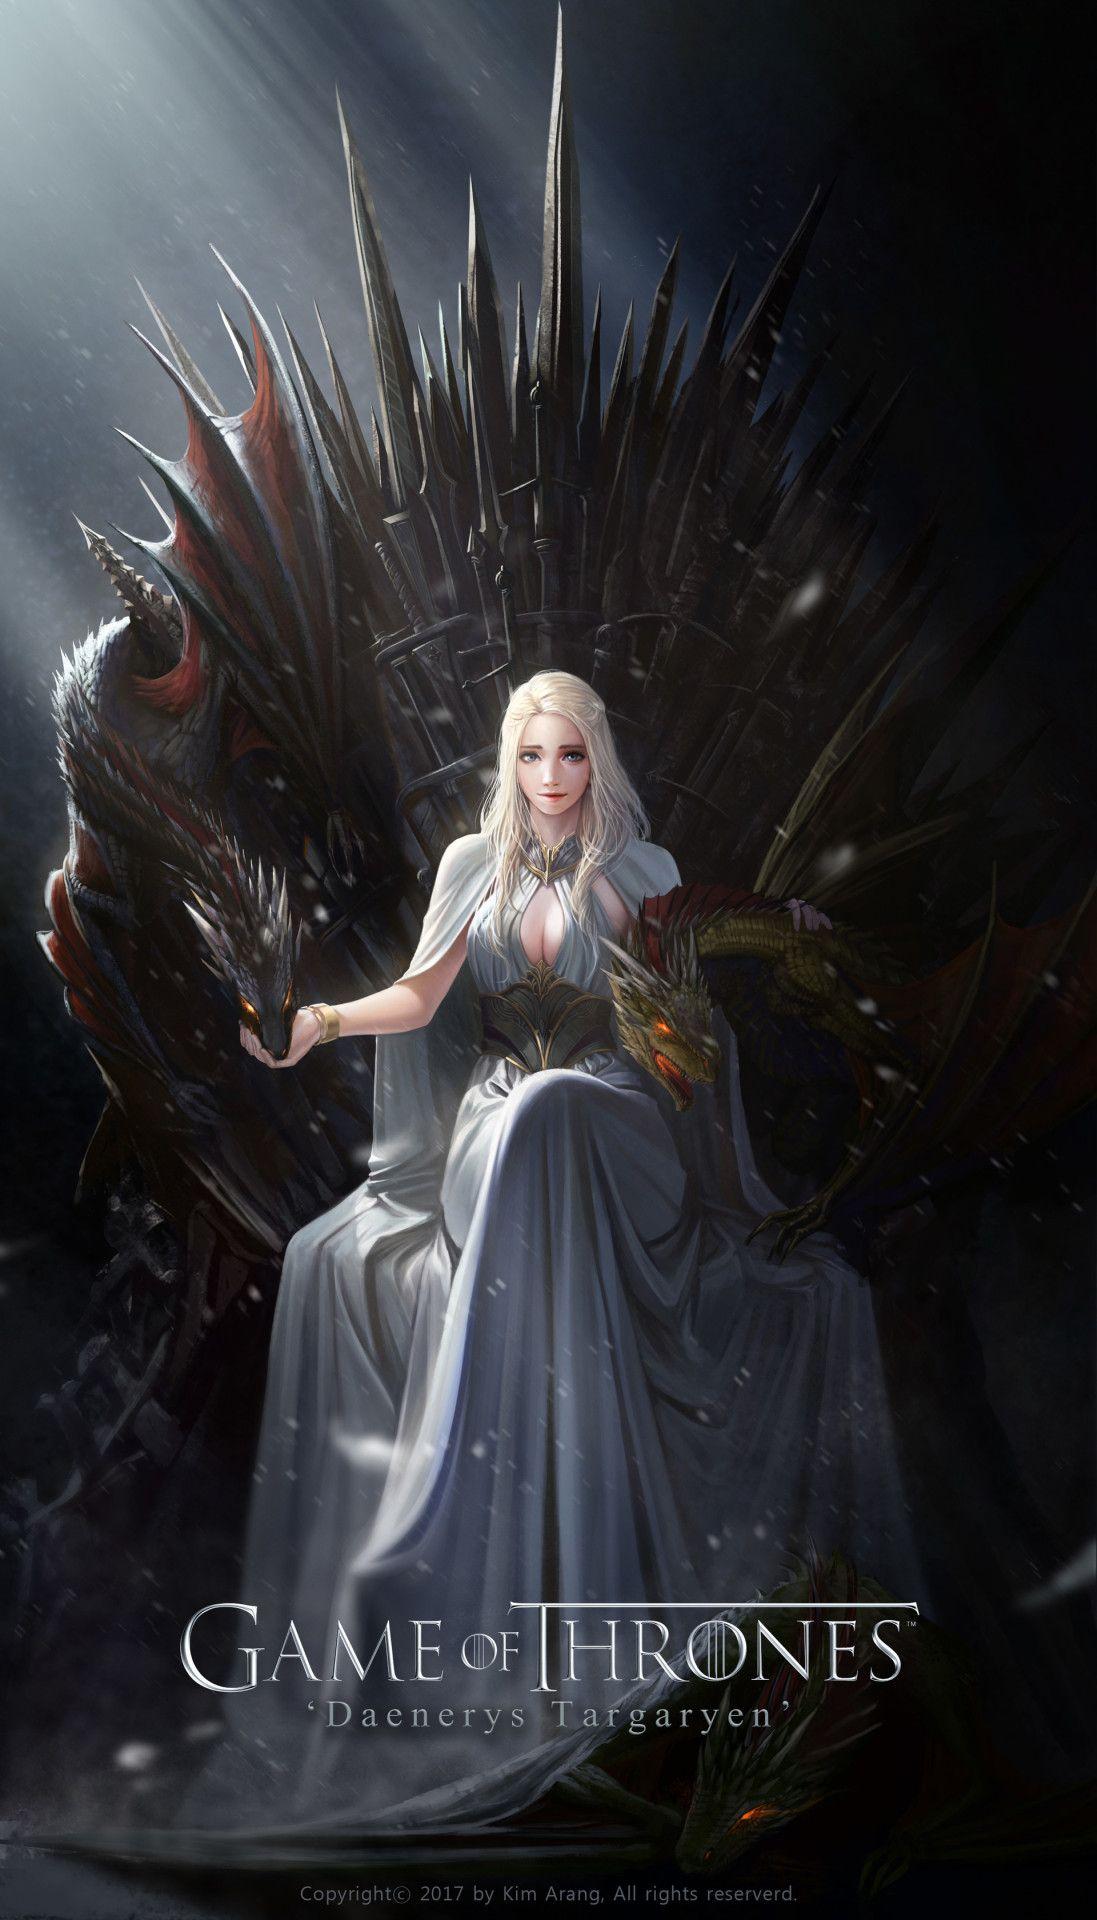 Daenerys Targaryen on the Iron Throne Stunning Digital